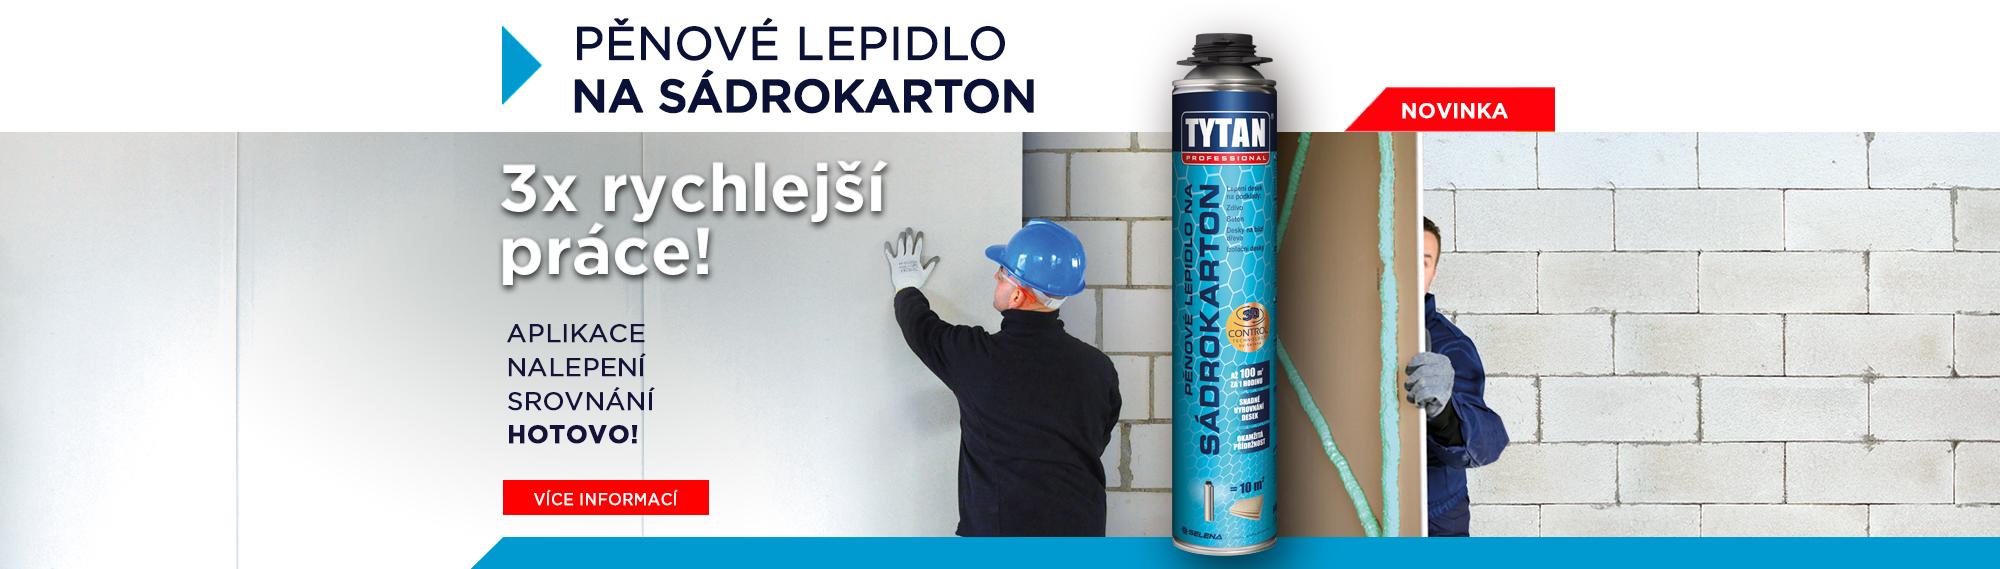 Tytan Professional: Pěnové lepidlo na sádrokarton